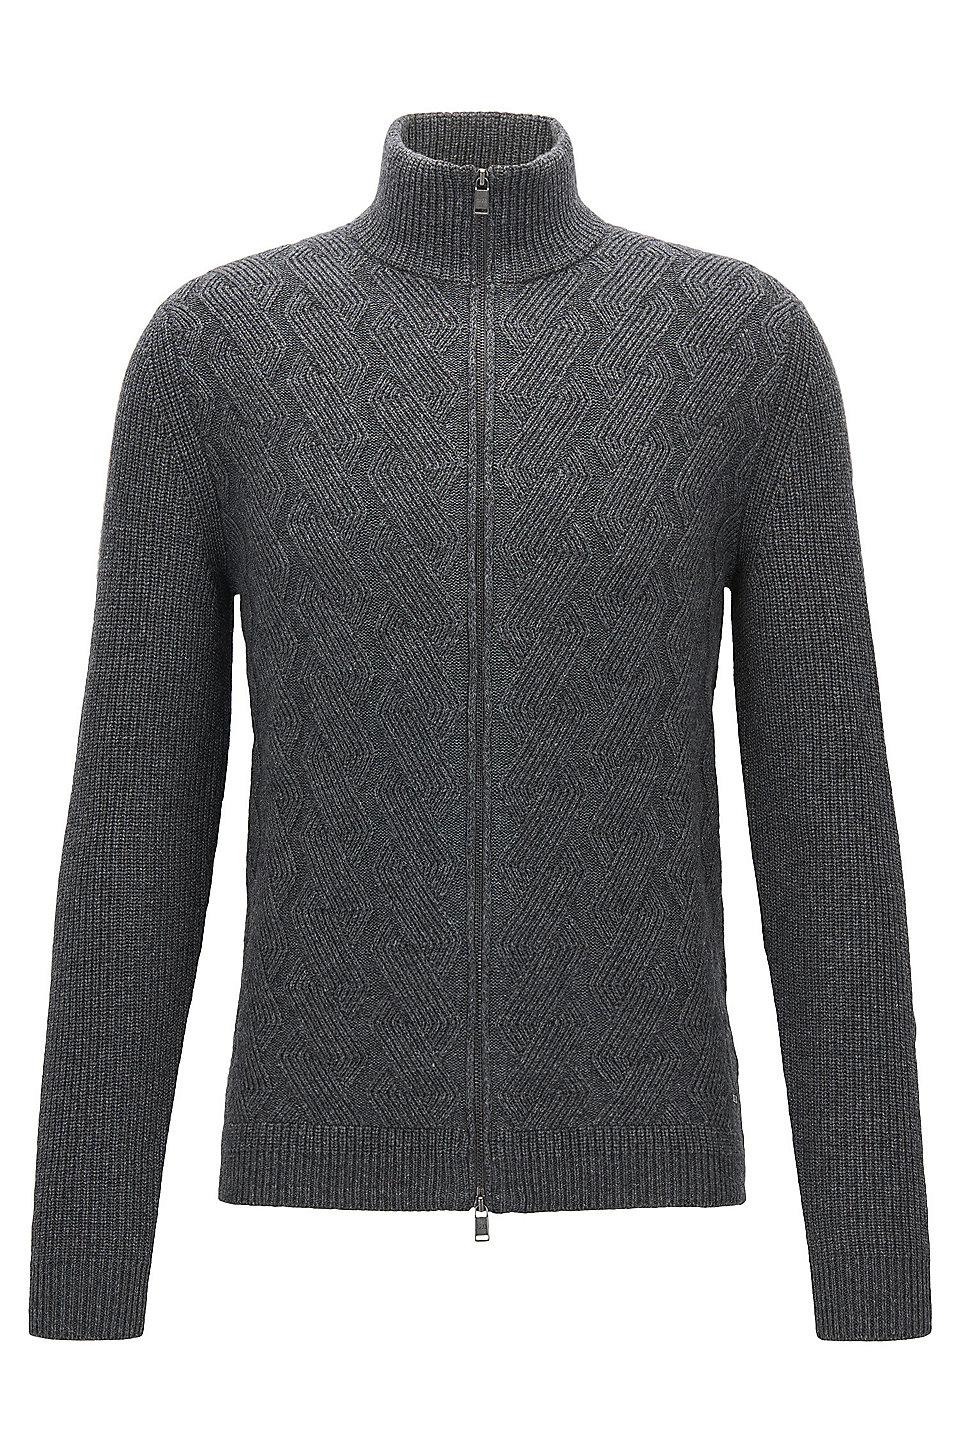 Virgin Wool Luxury Blend Full-Zip Cardigan | Naik